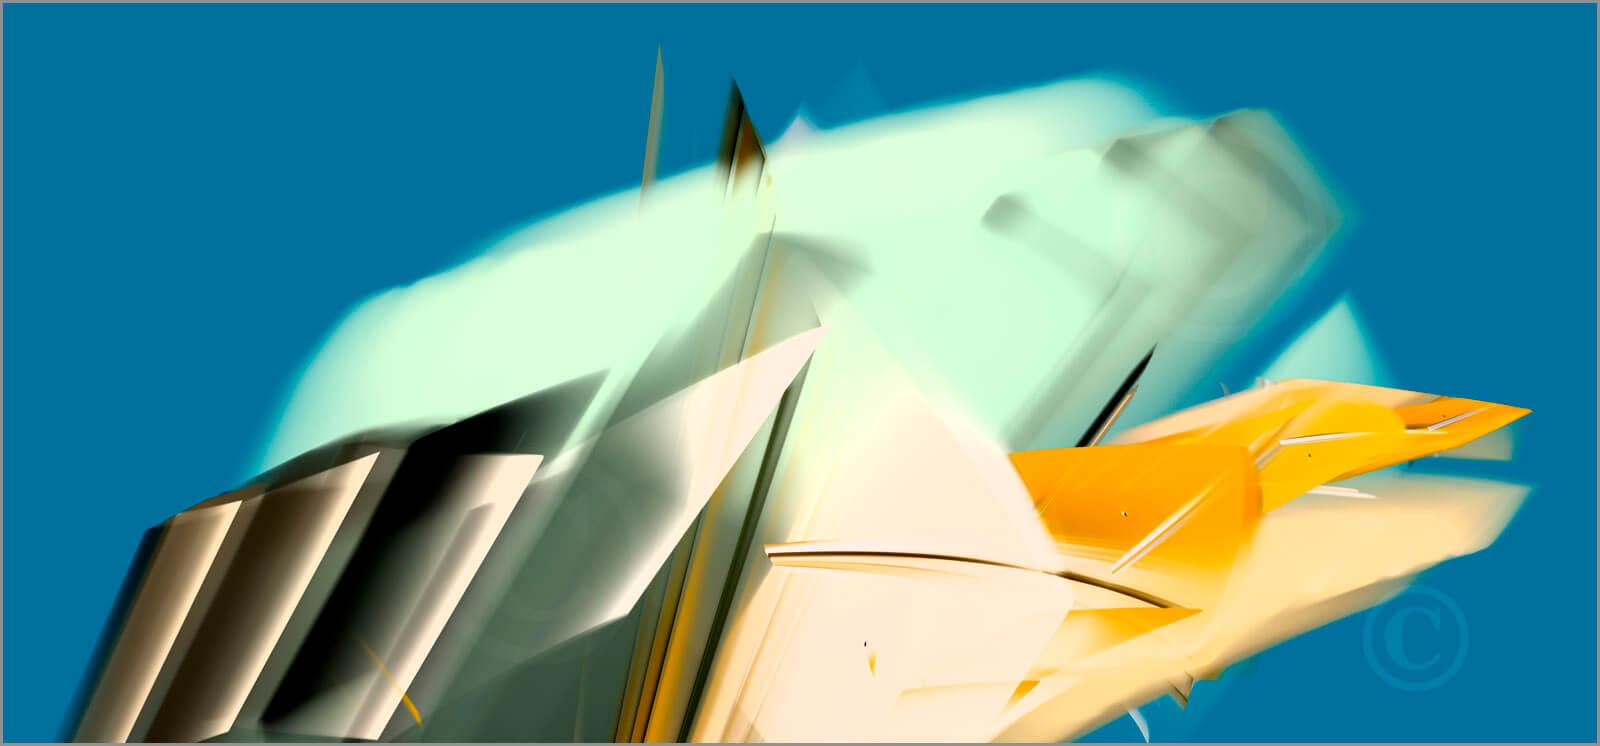 Shapes_F2_27967_XL